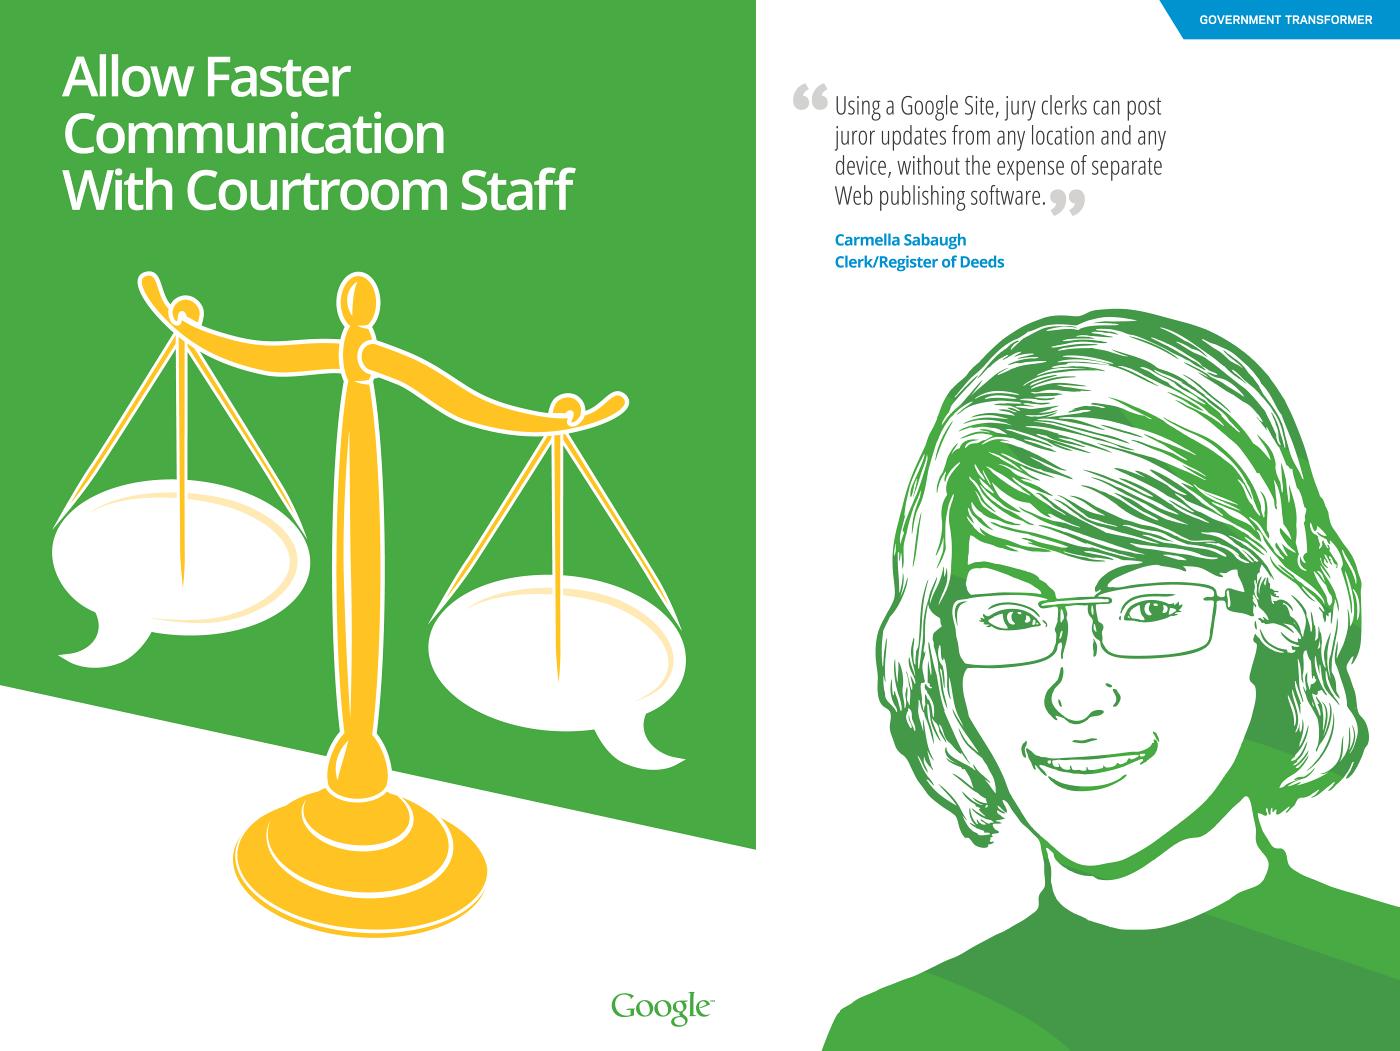 Carmella Sabaugh, Google Government Transformer Case Study